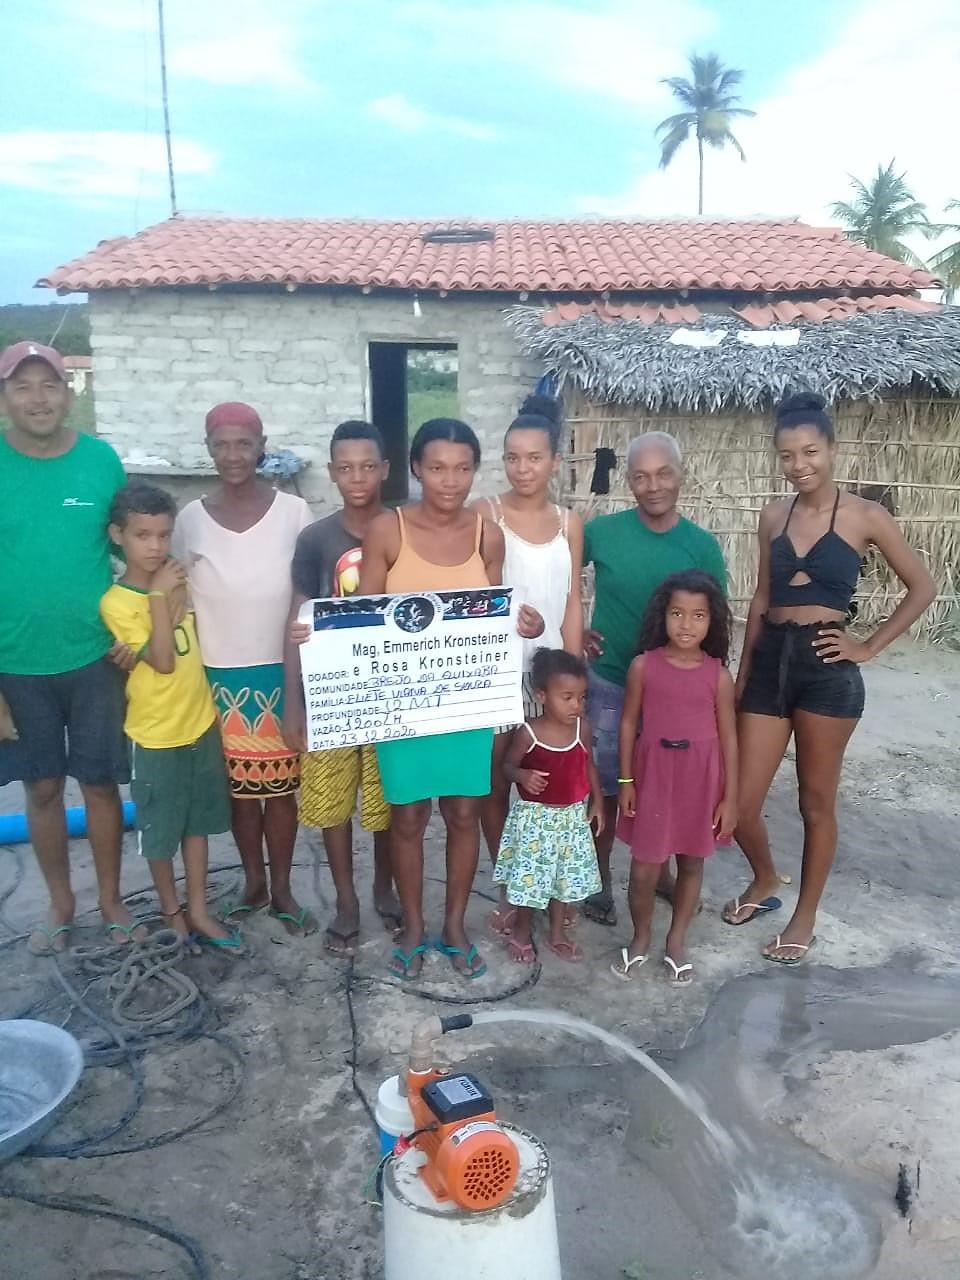 2020-12-23 Bahia - Image 2